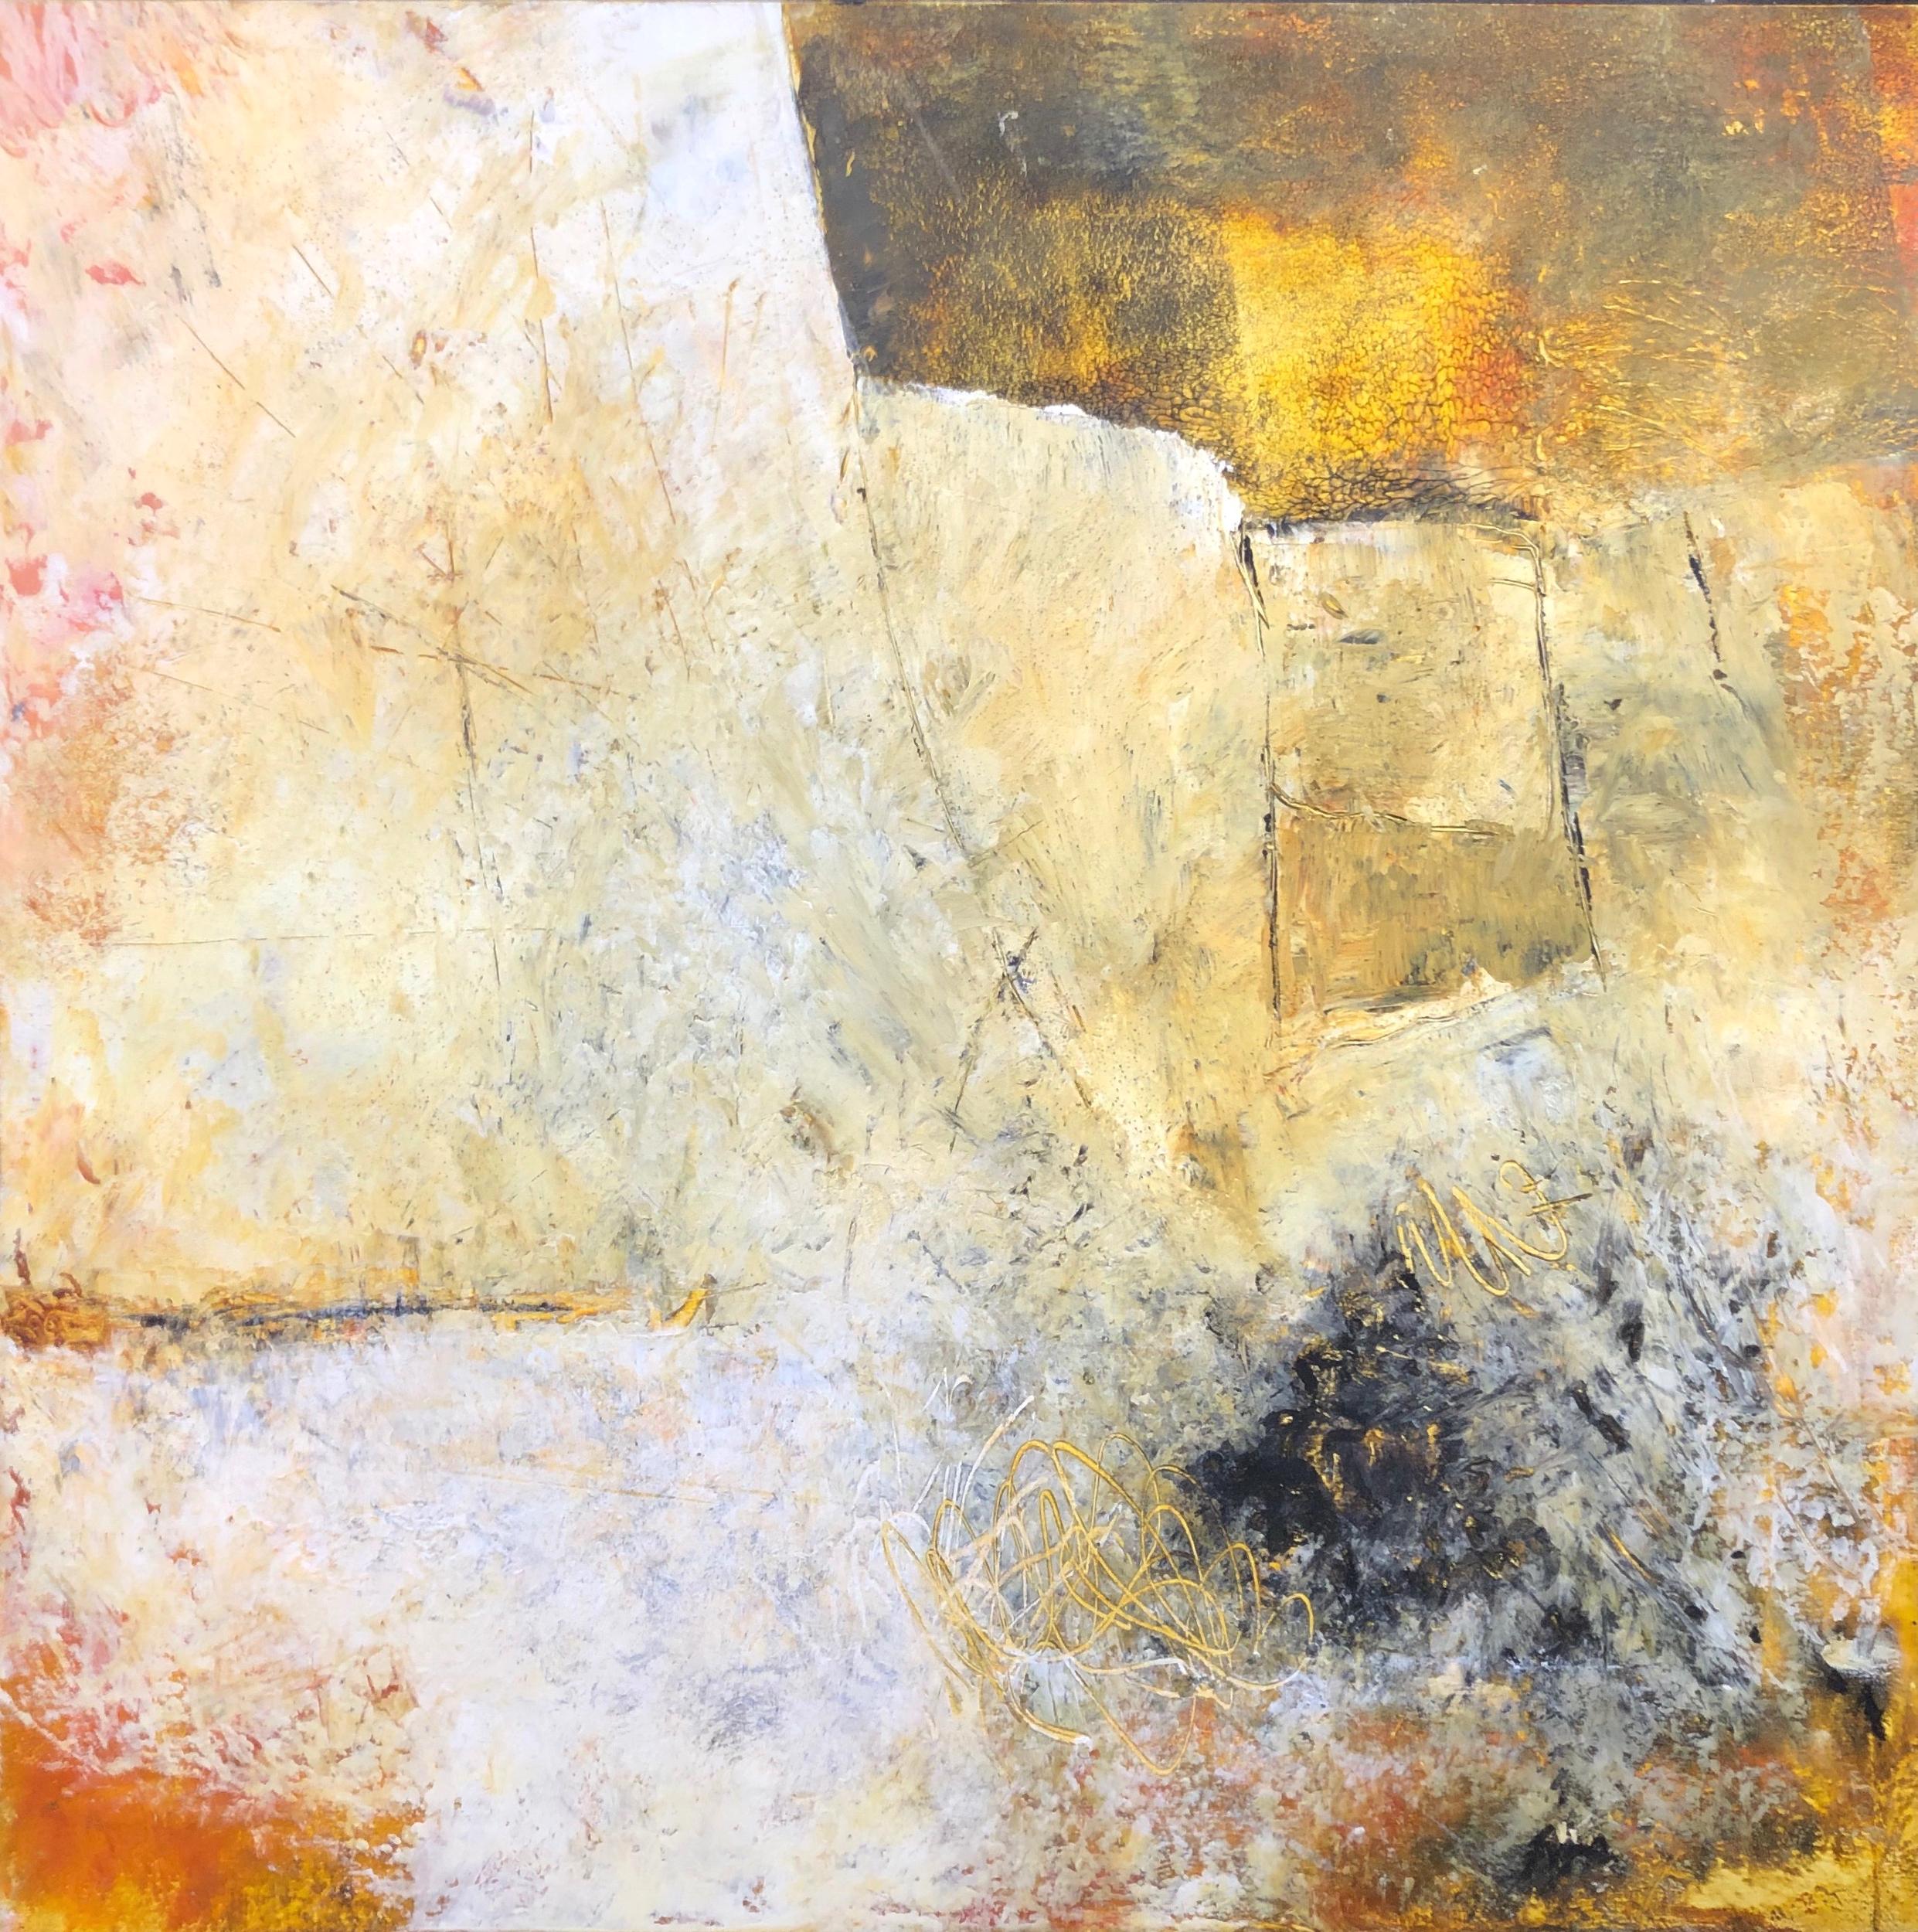 Walls of Nineveh VI 40x40 Cold Wax & Oil on Wood Panels